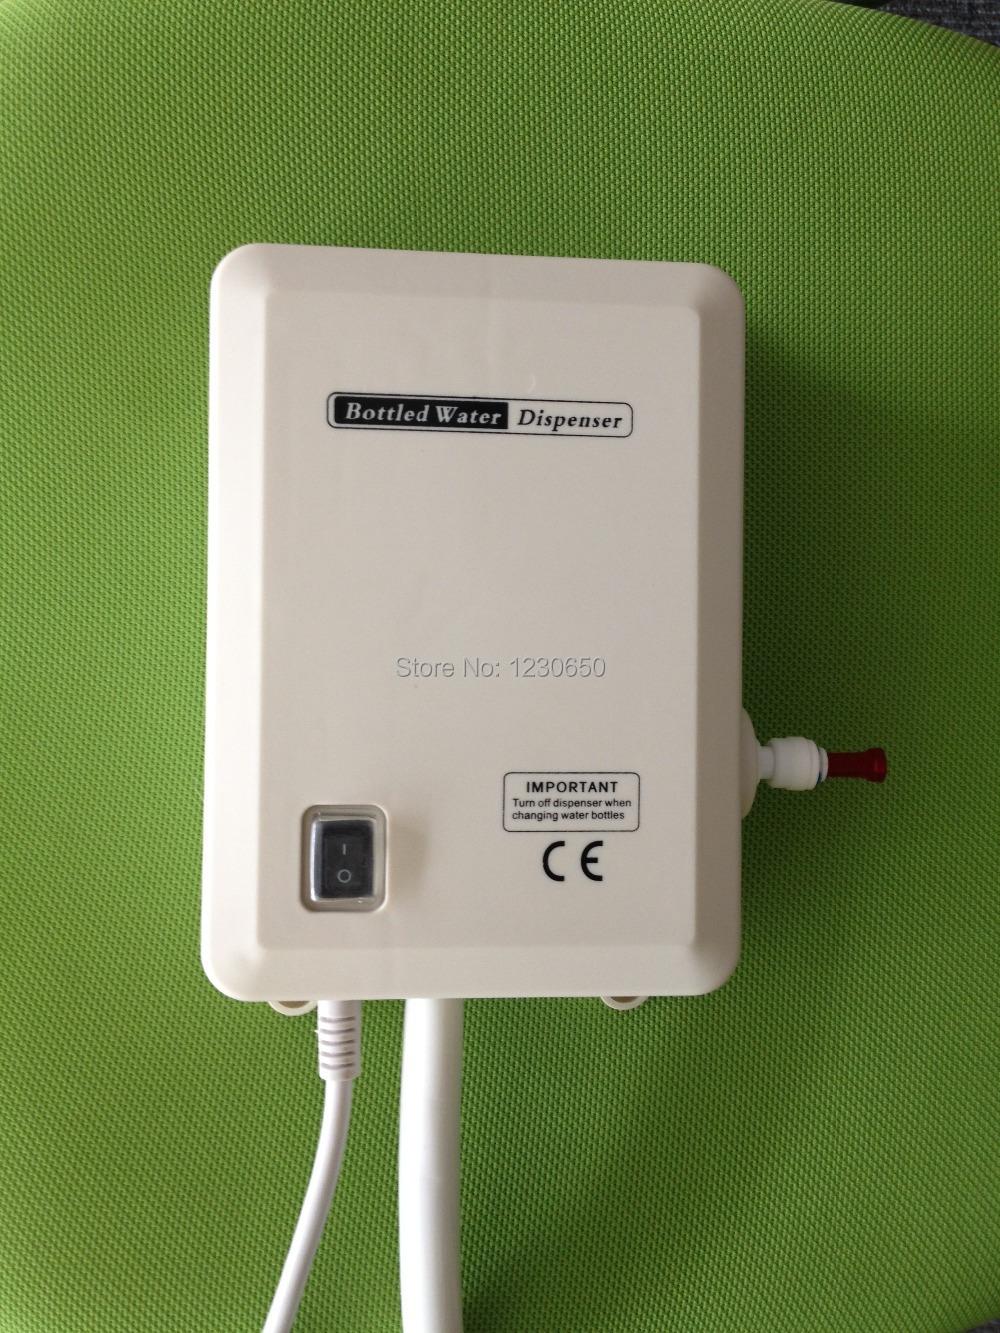 Magic 5 Gallon Bottled water dispenser Flojet Pump for freezer &coffee maker BW1000A(China (Mainland))